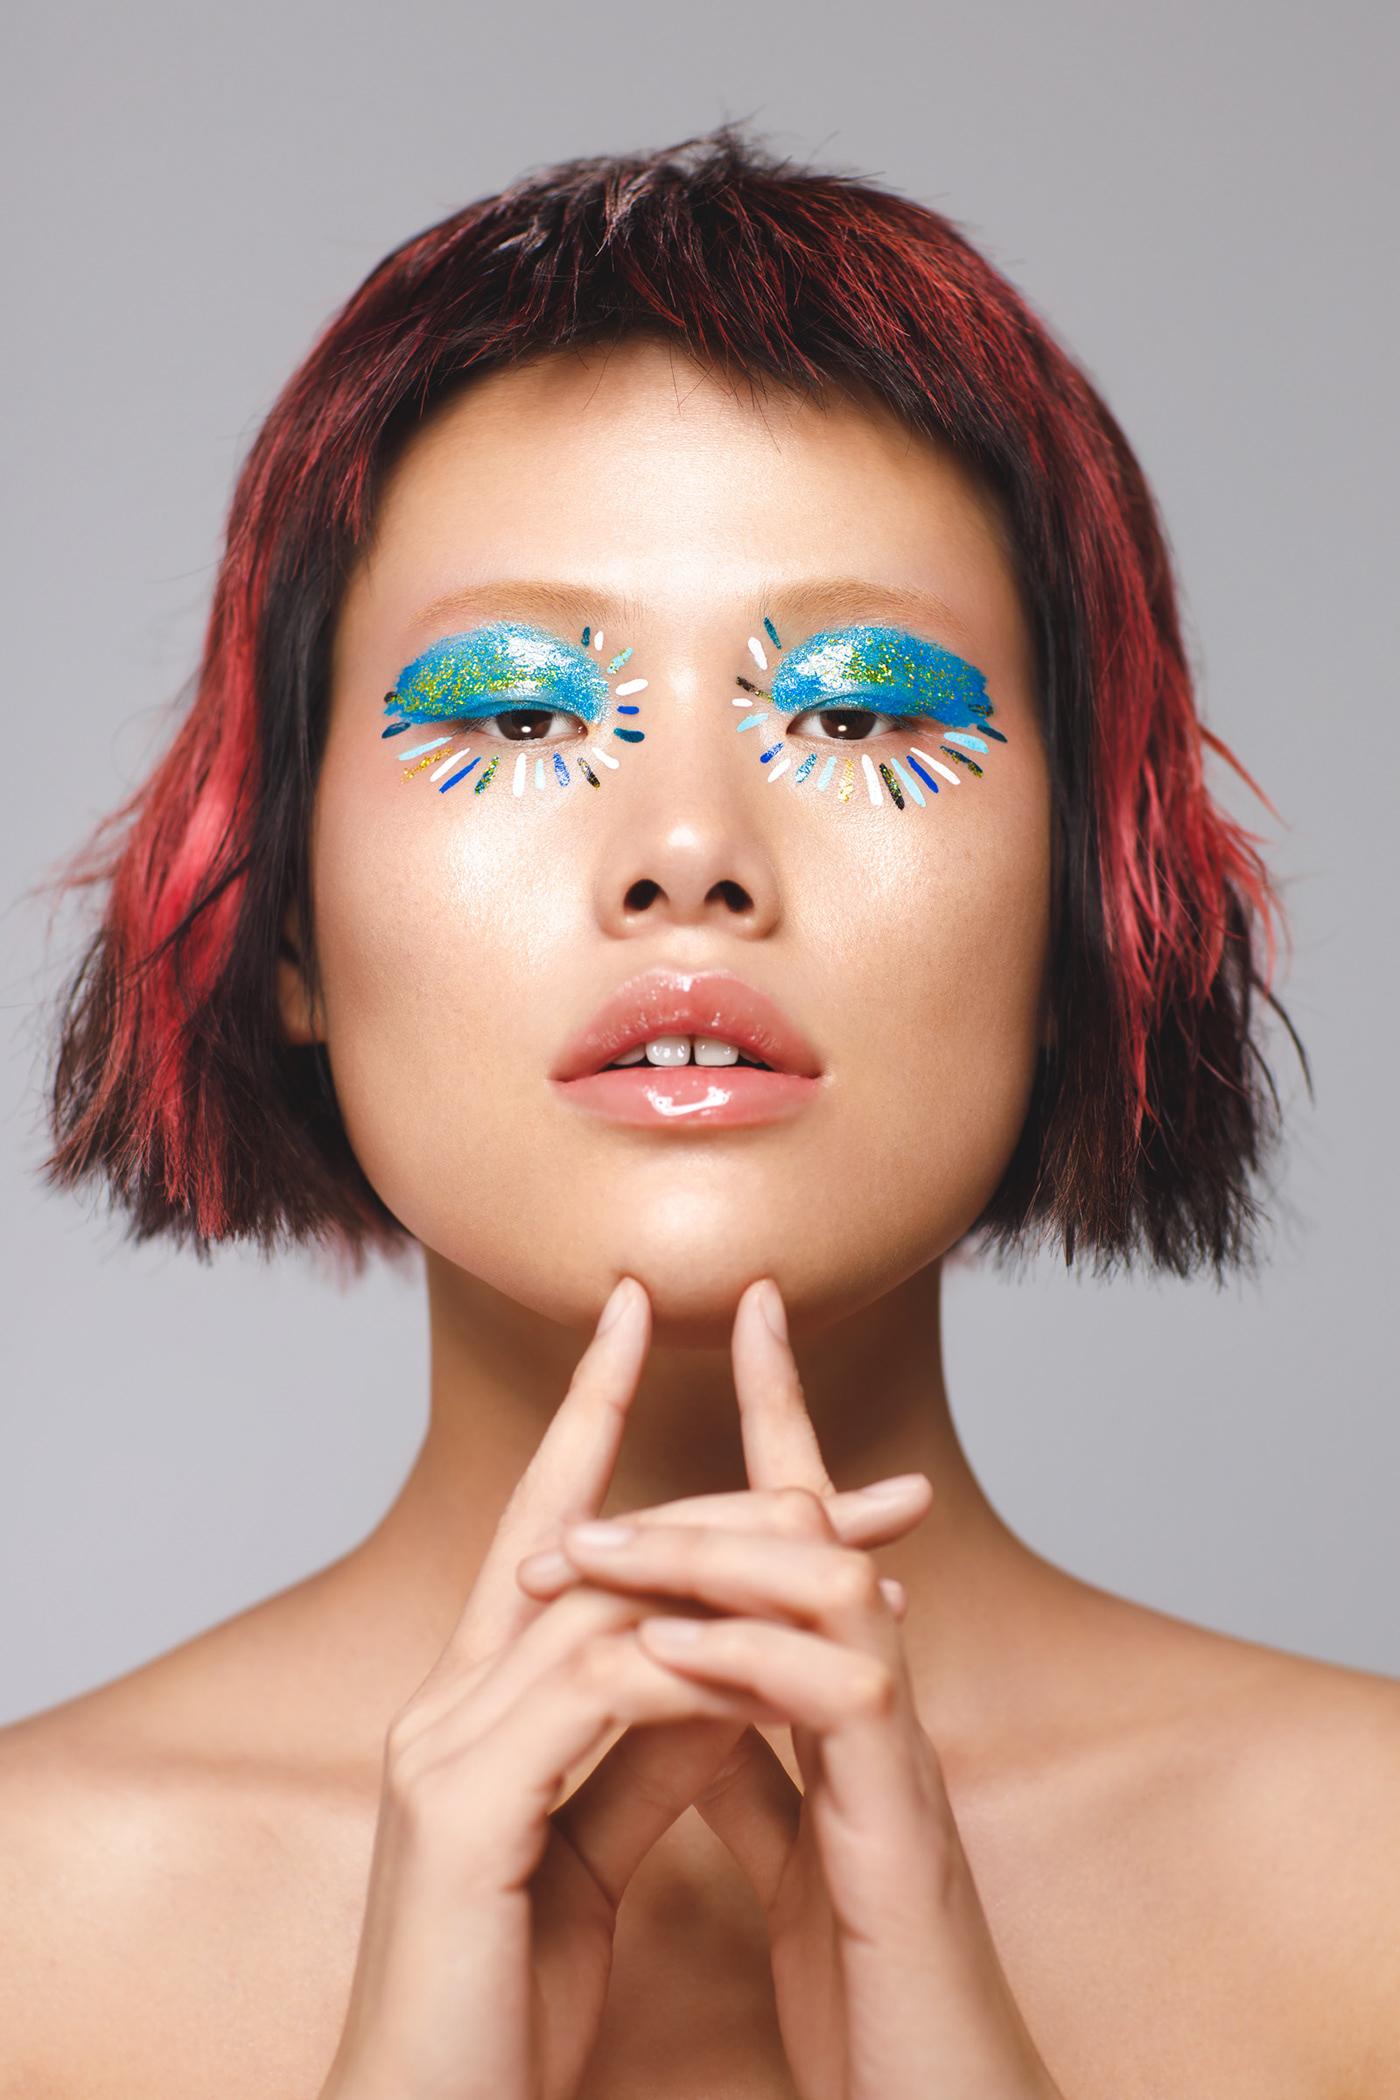 beauty closeup cosmetics cover editorial magazine makeup Montreal portrait